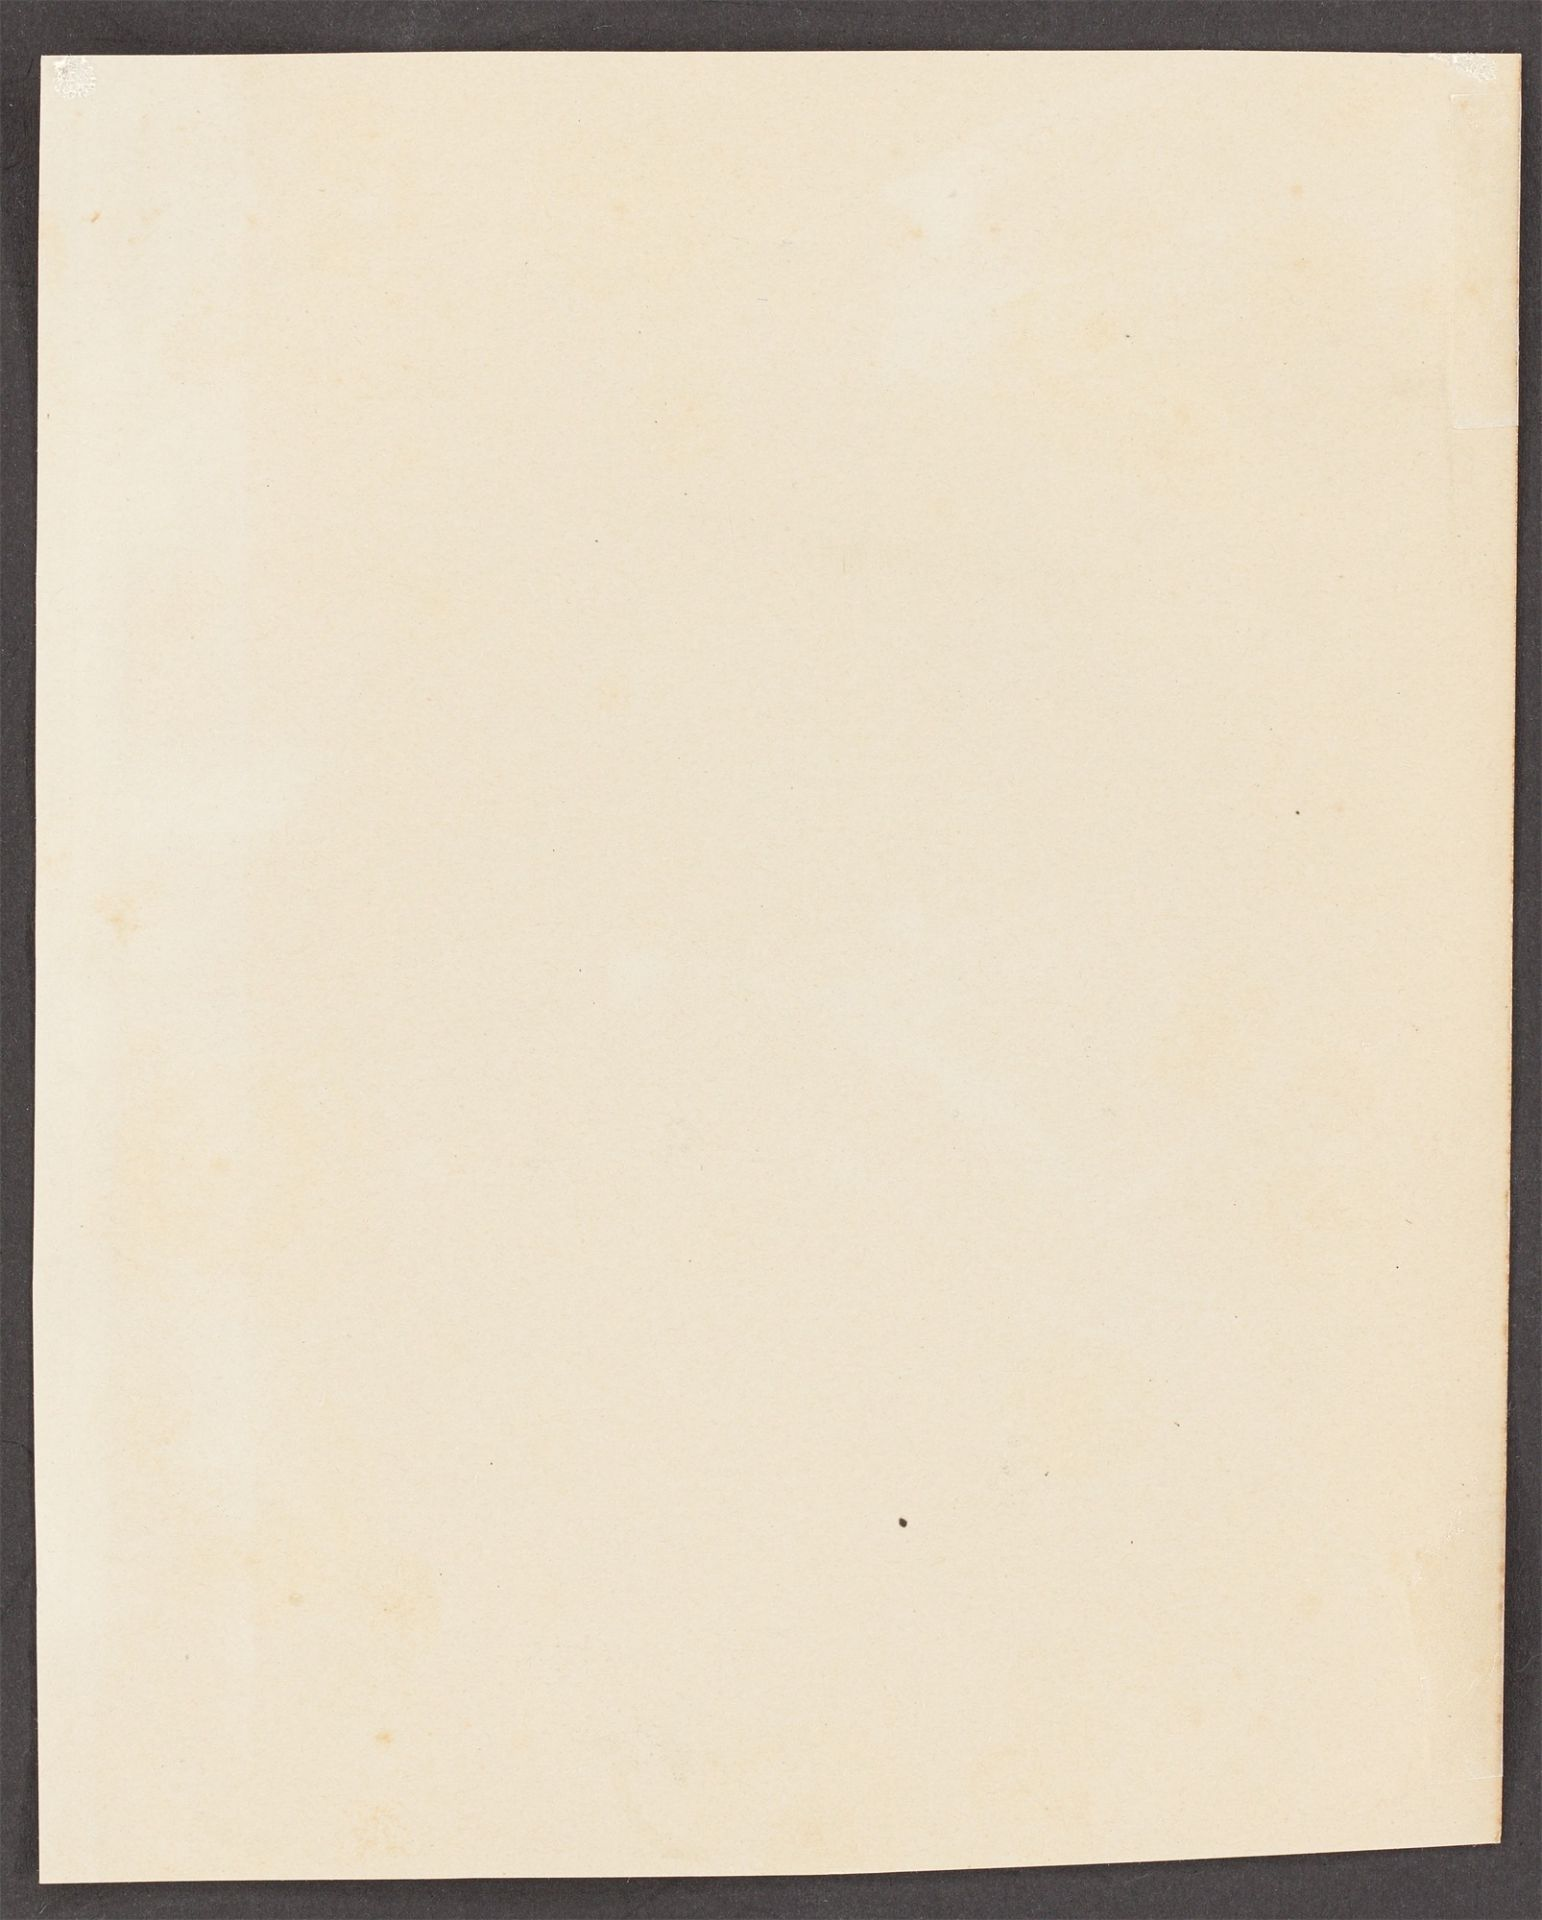 Jean Cocteau. Faun and girl. - Image 3 of 3